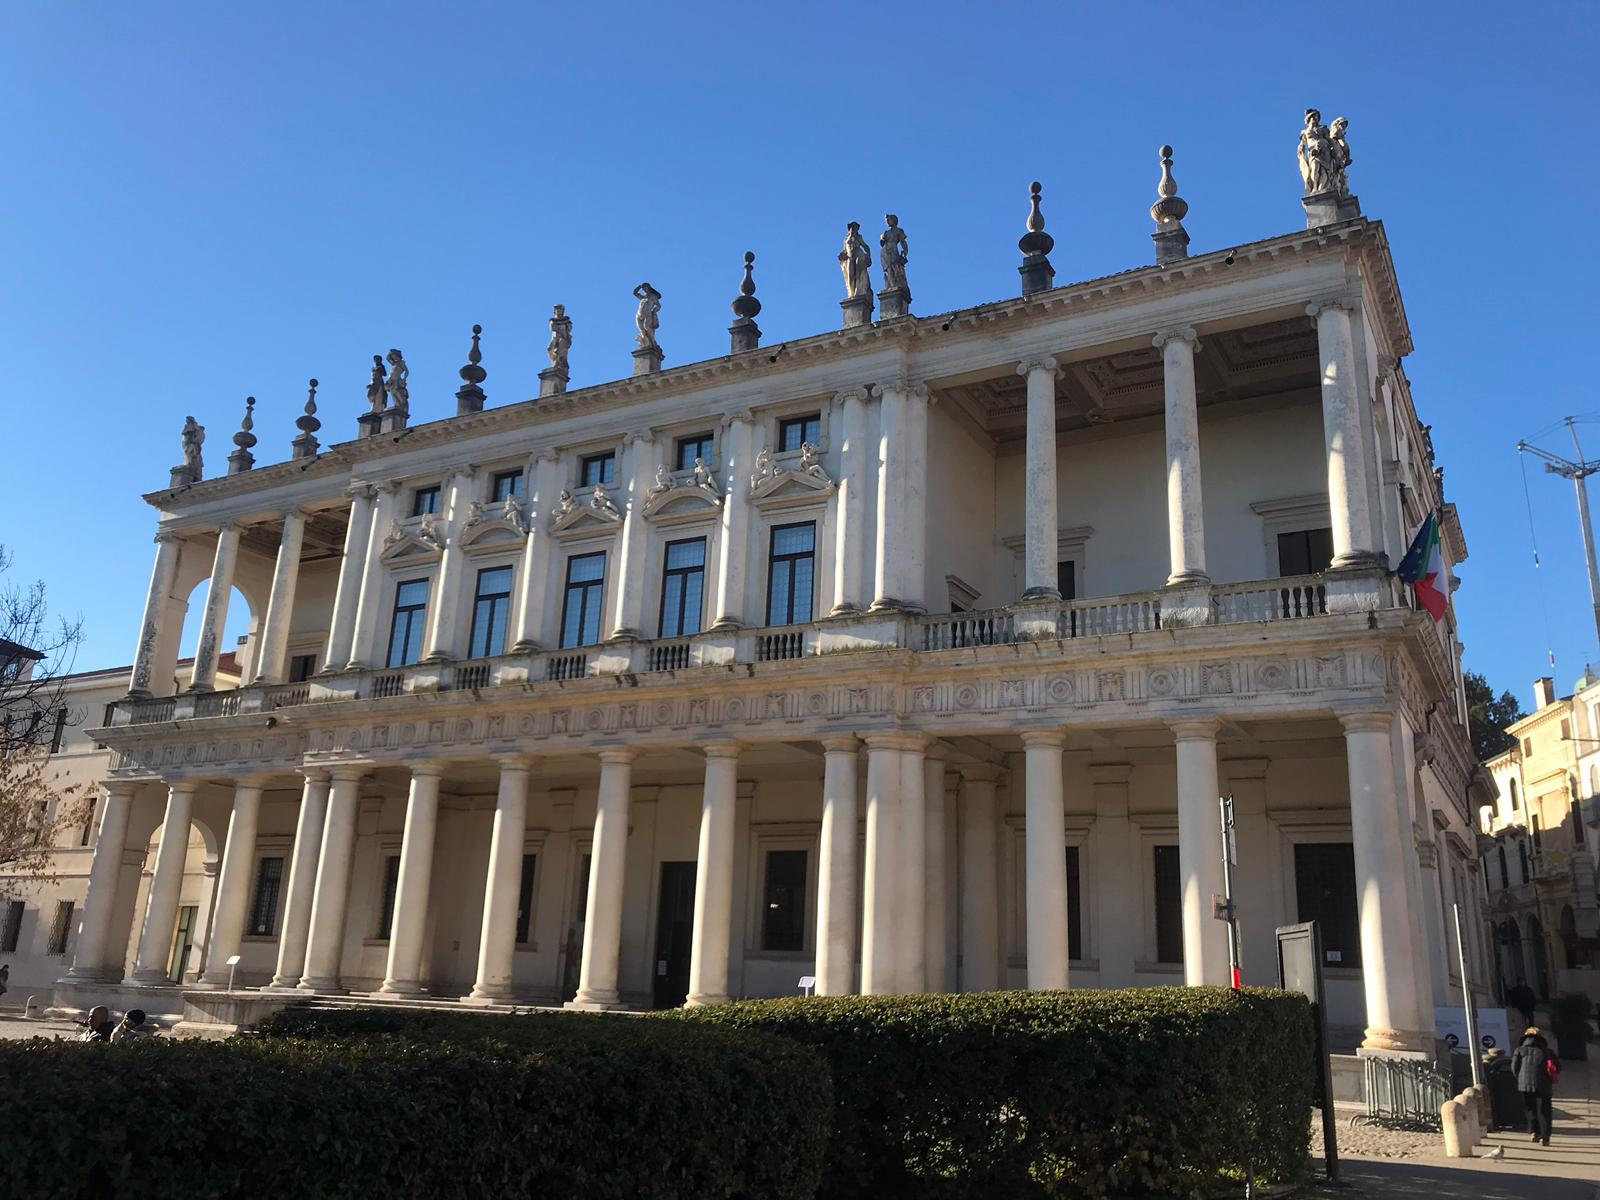 Palazzo Chiericati, Vicenza's art gallery